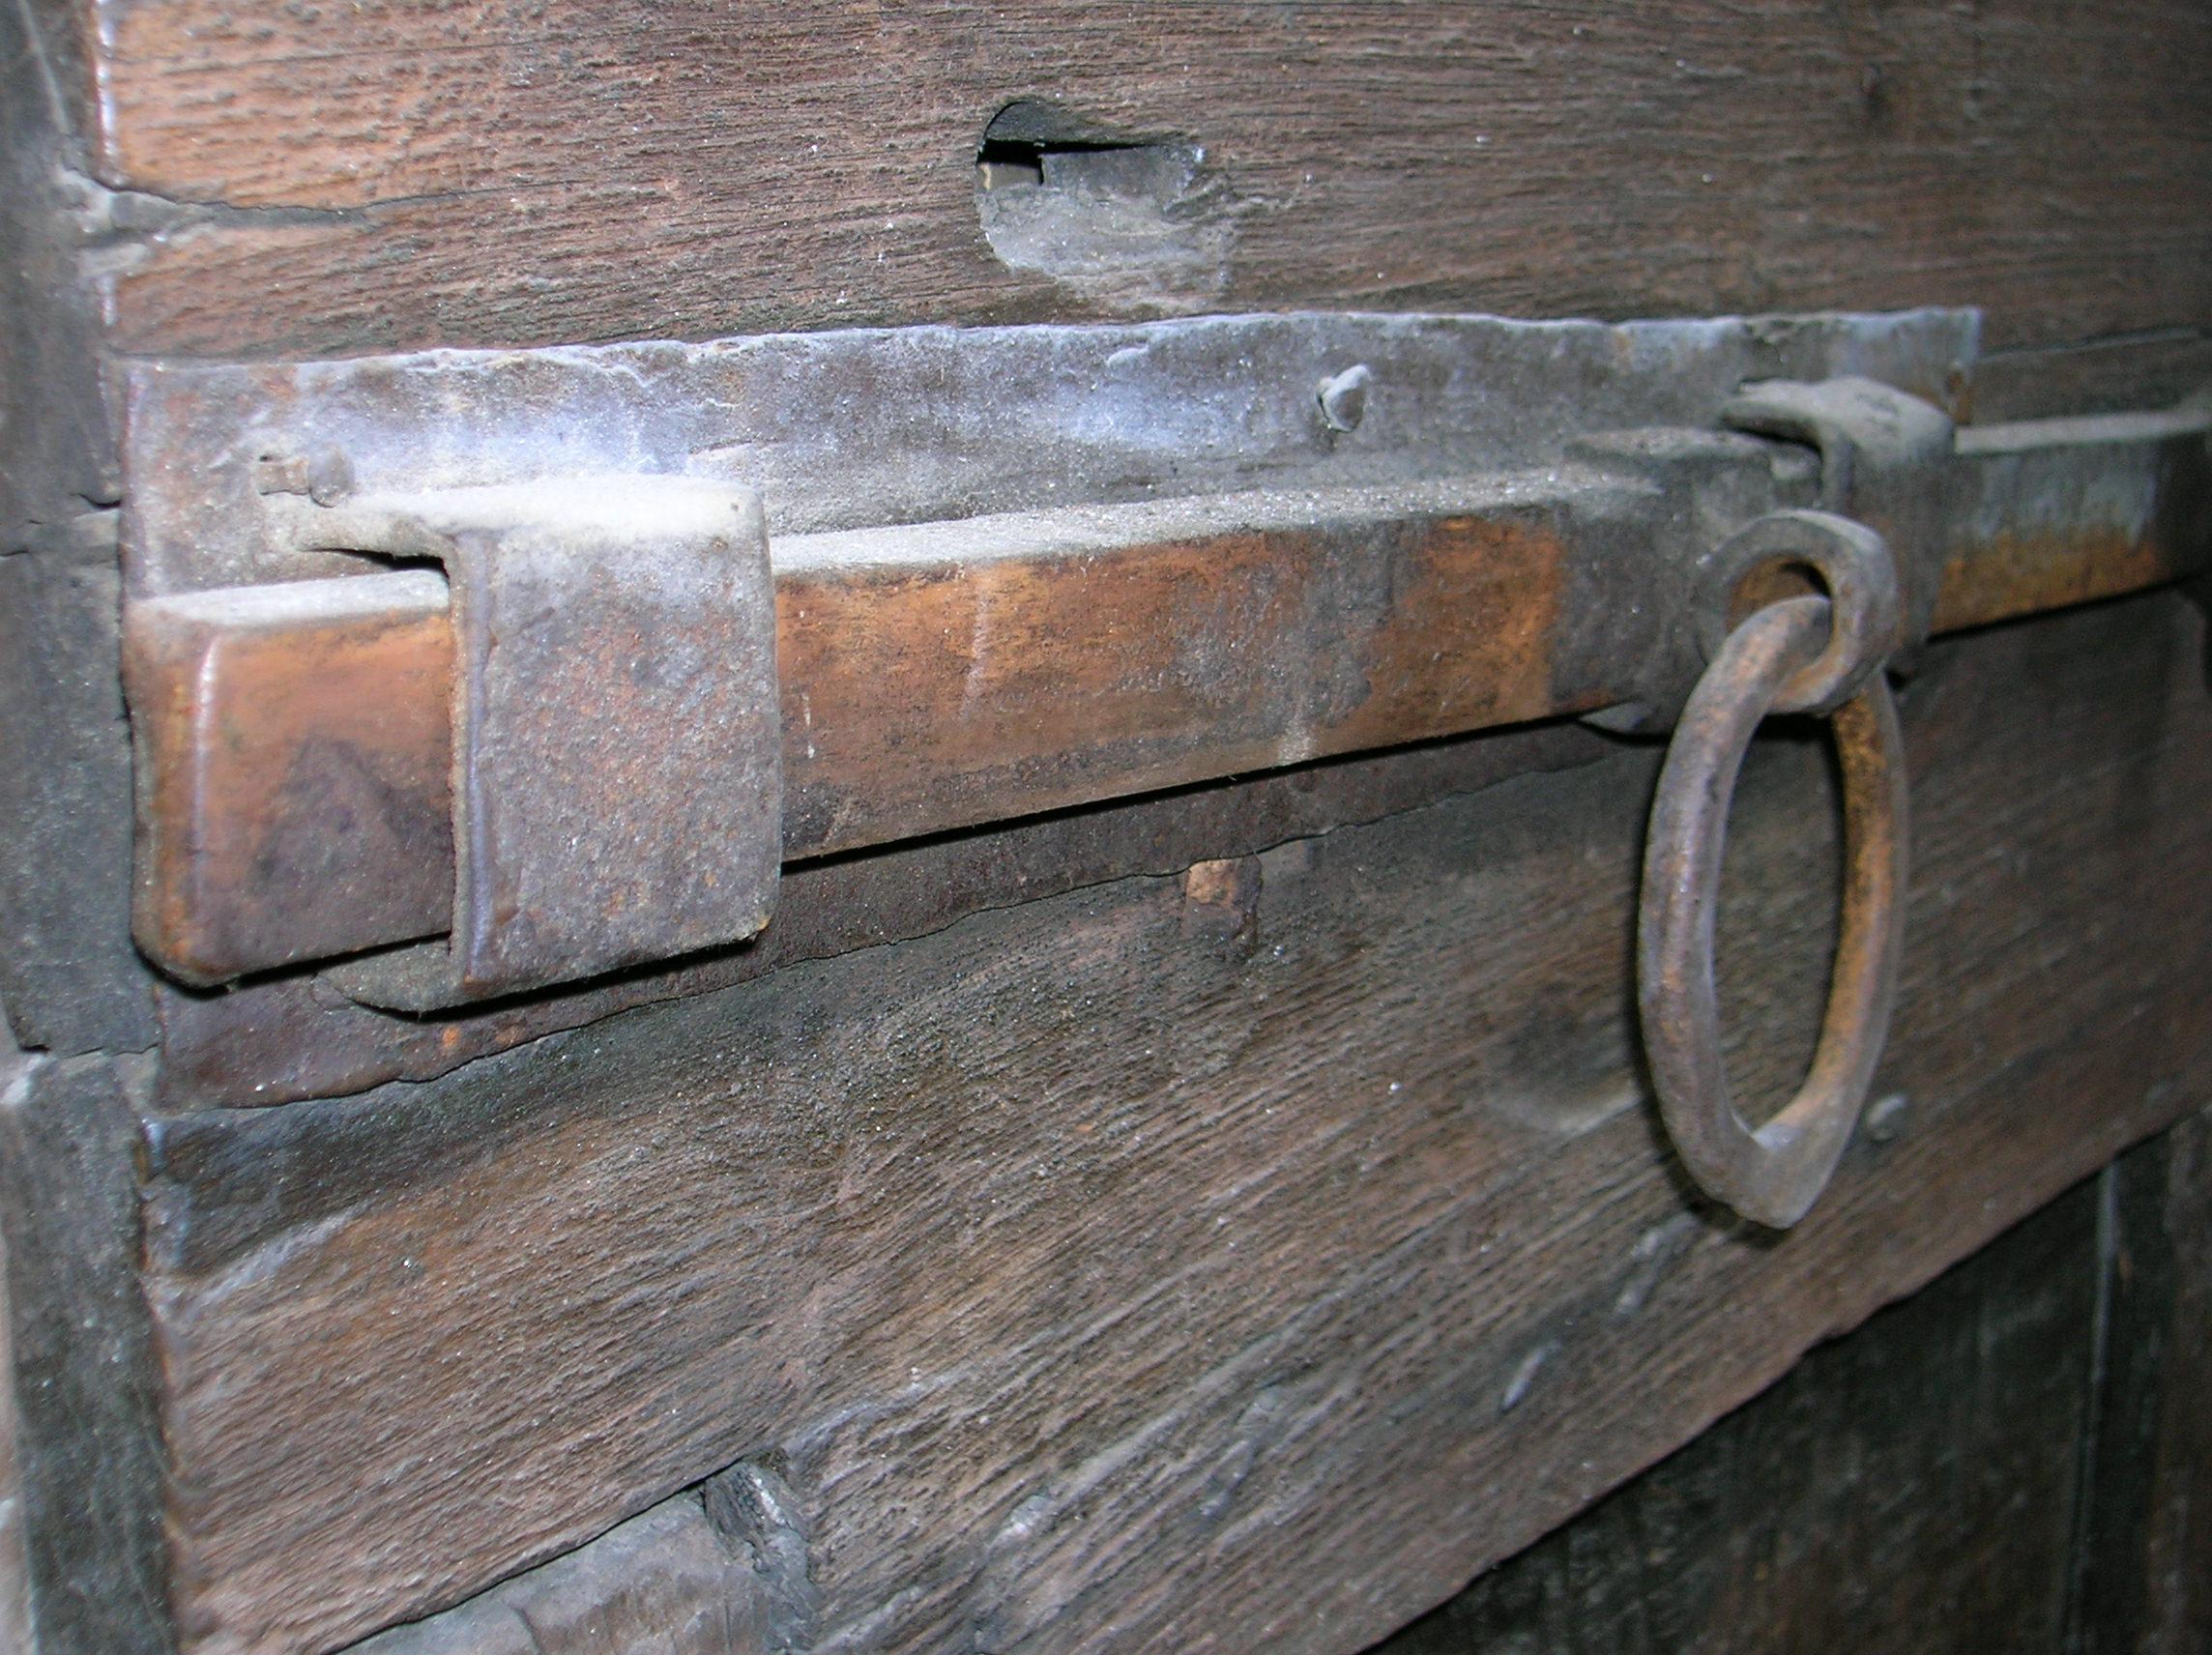 Bolt Door Meaning  Picturescstlock N Bolt Locksmith - What does shut the front door mean